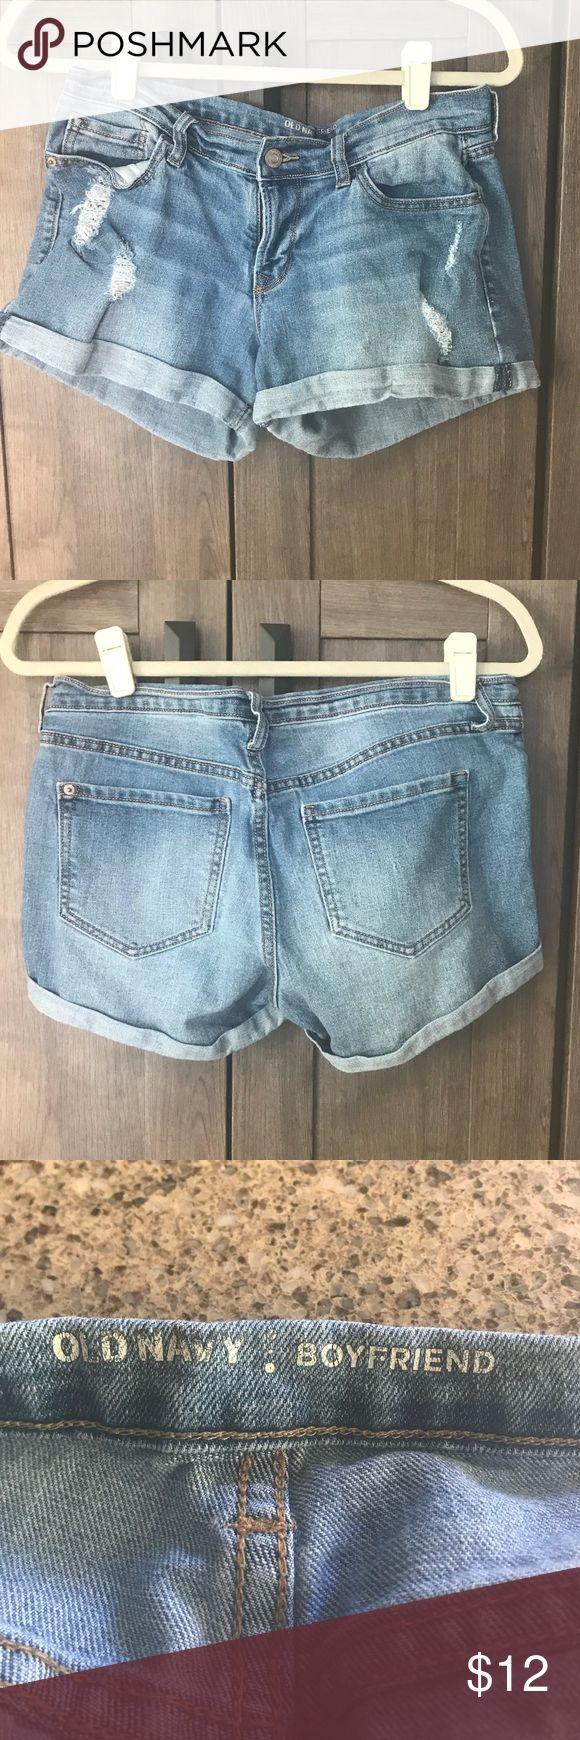 "Old Navy Boyfriend Distressed shorts Old navy boyfriend jean shorts. Size 4. Inseam 3"". Old Navy Shorts"